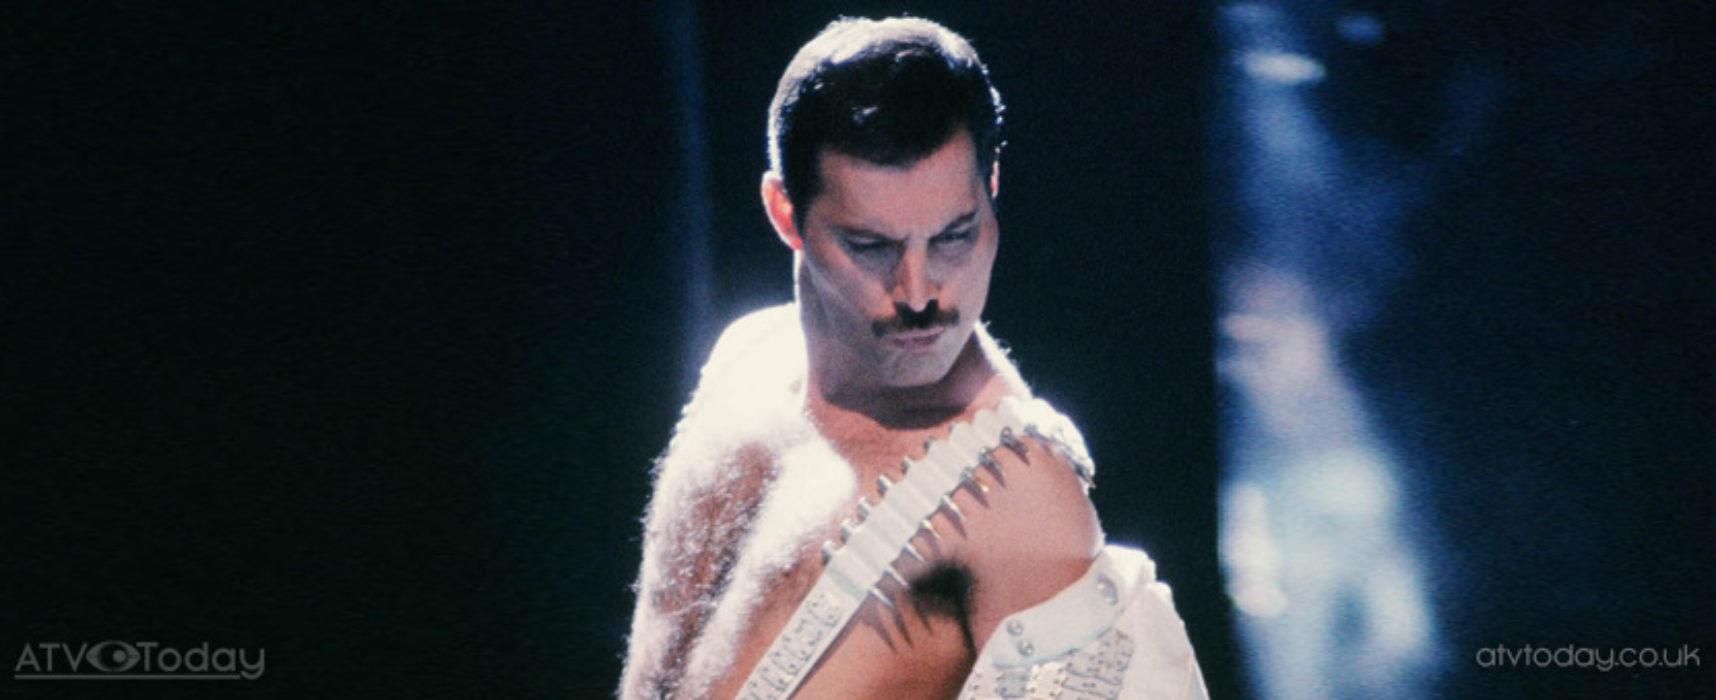 Freddie Mercury, Elton John & Paul McCartney voted into 'super group'